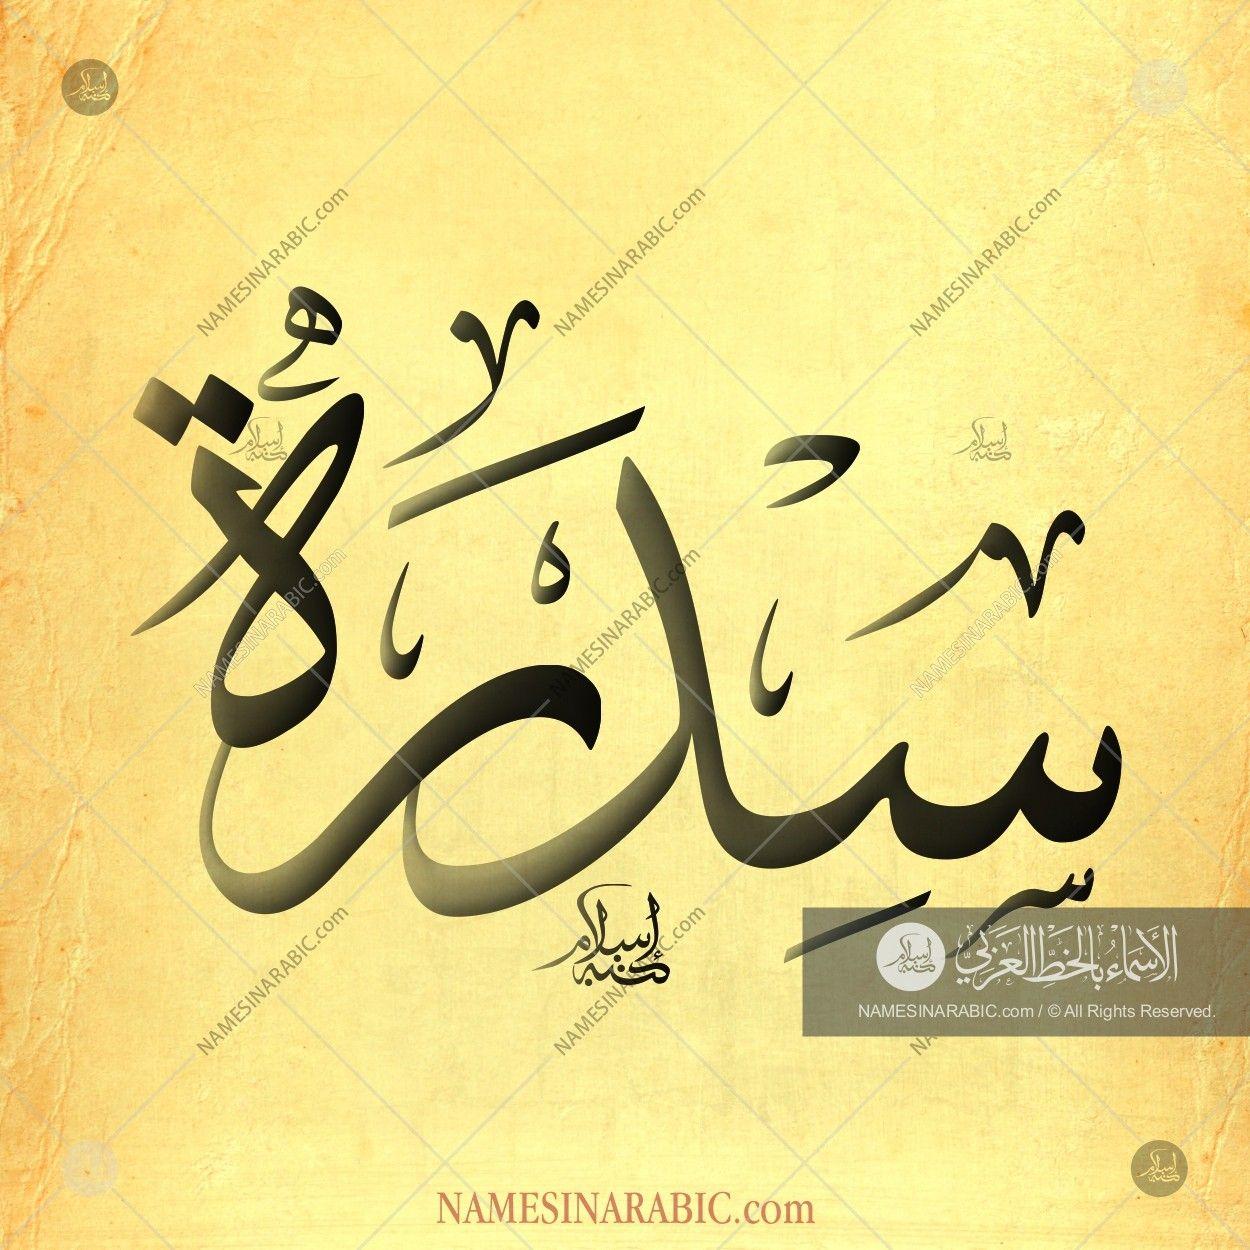 Sidra سدرة Names In Arabic Calligraphy Name 1767 Name Wallpaper Calligraphy Name Calligraphy